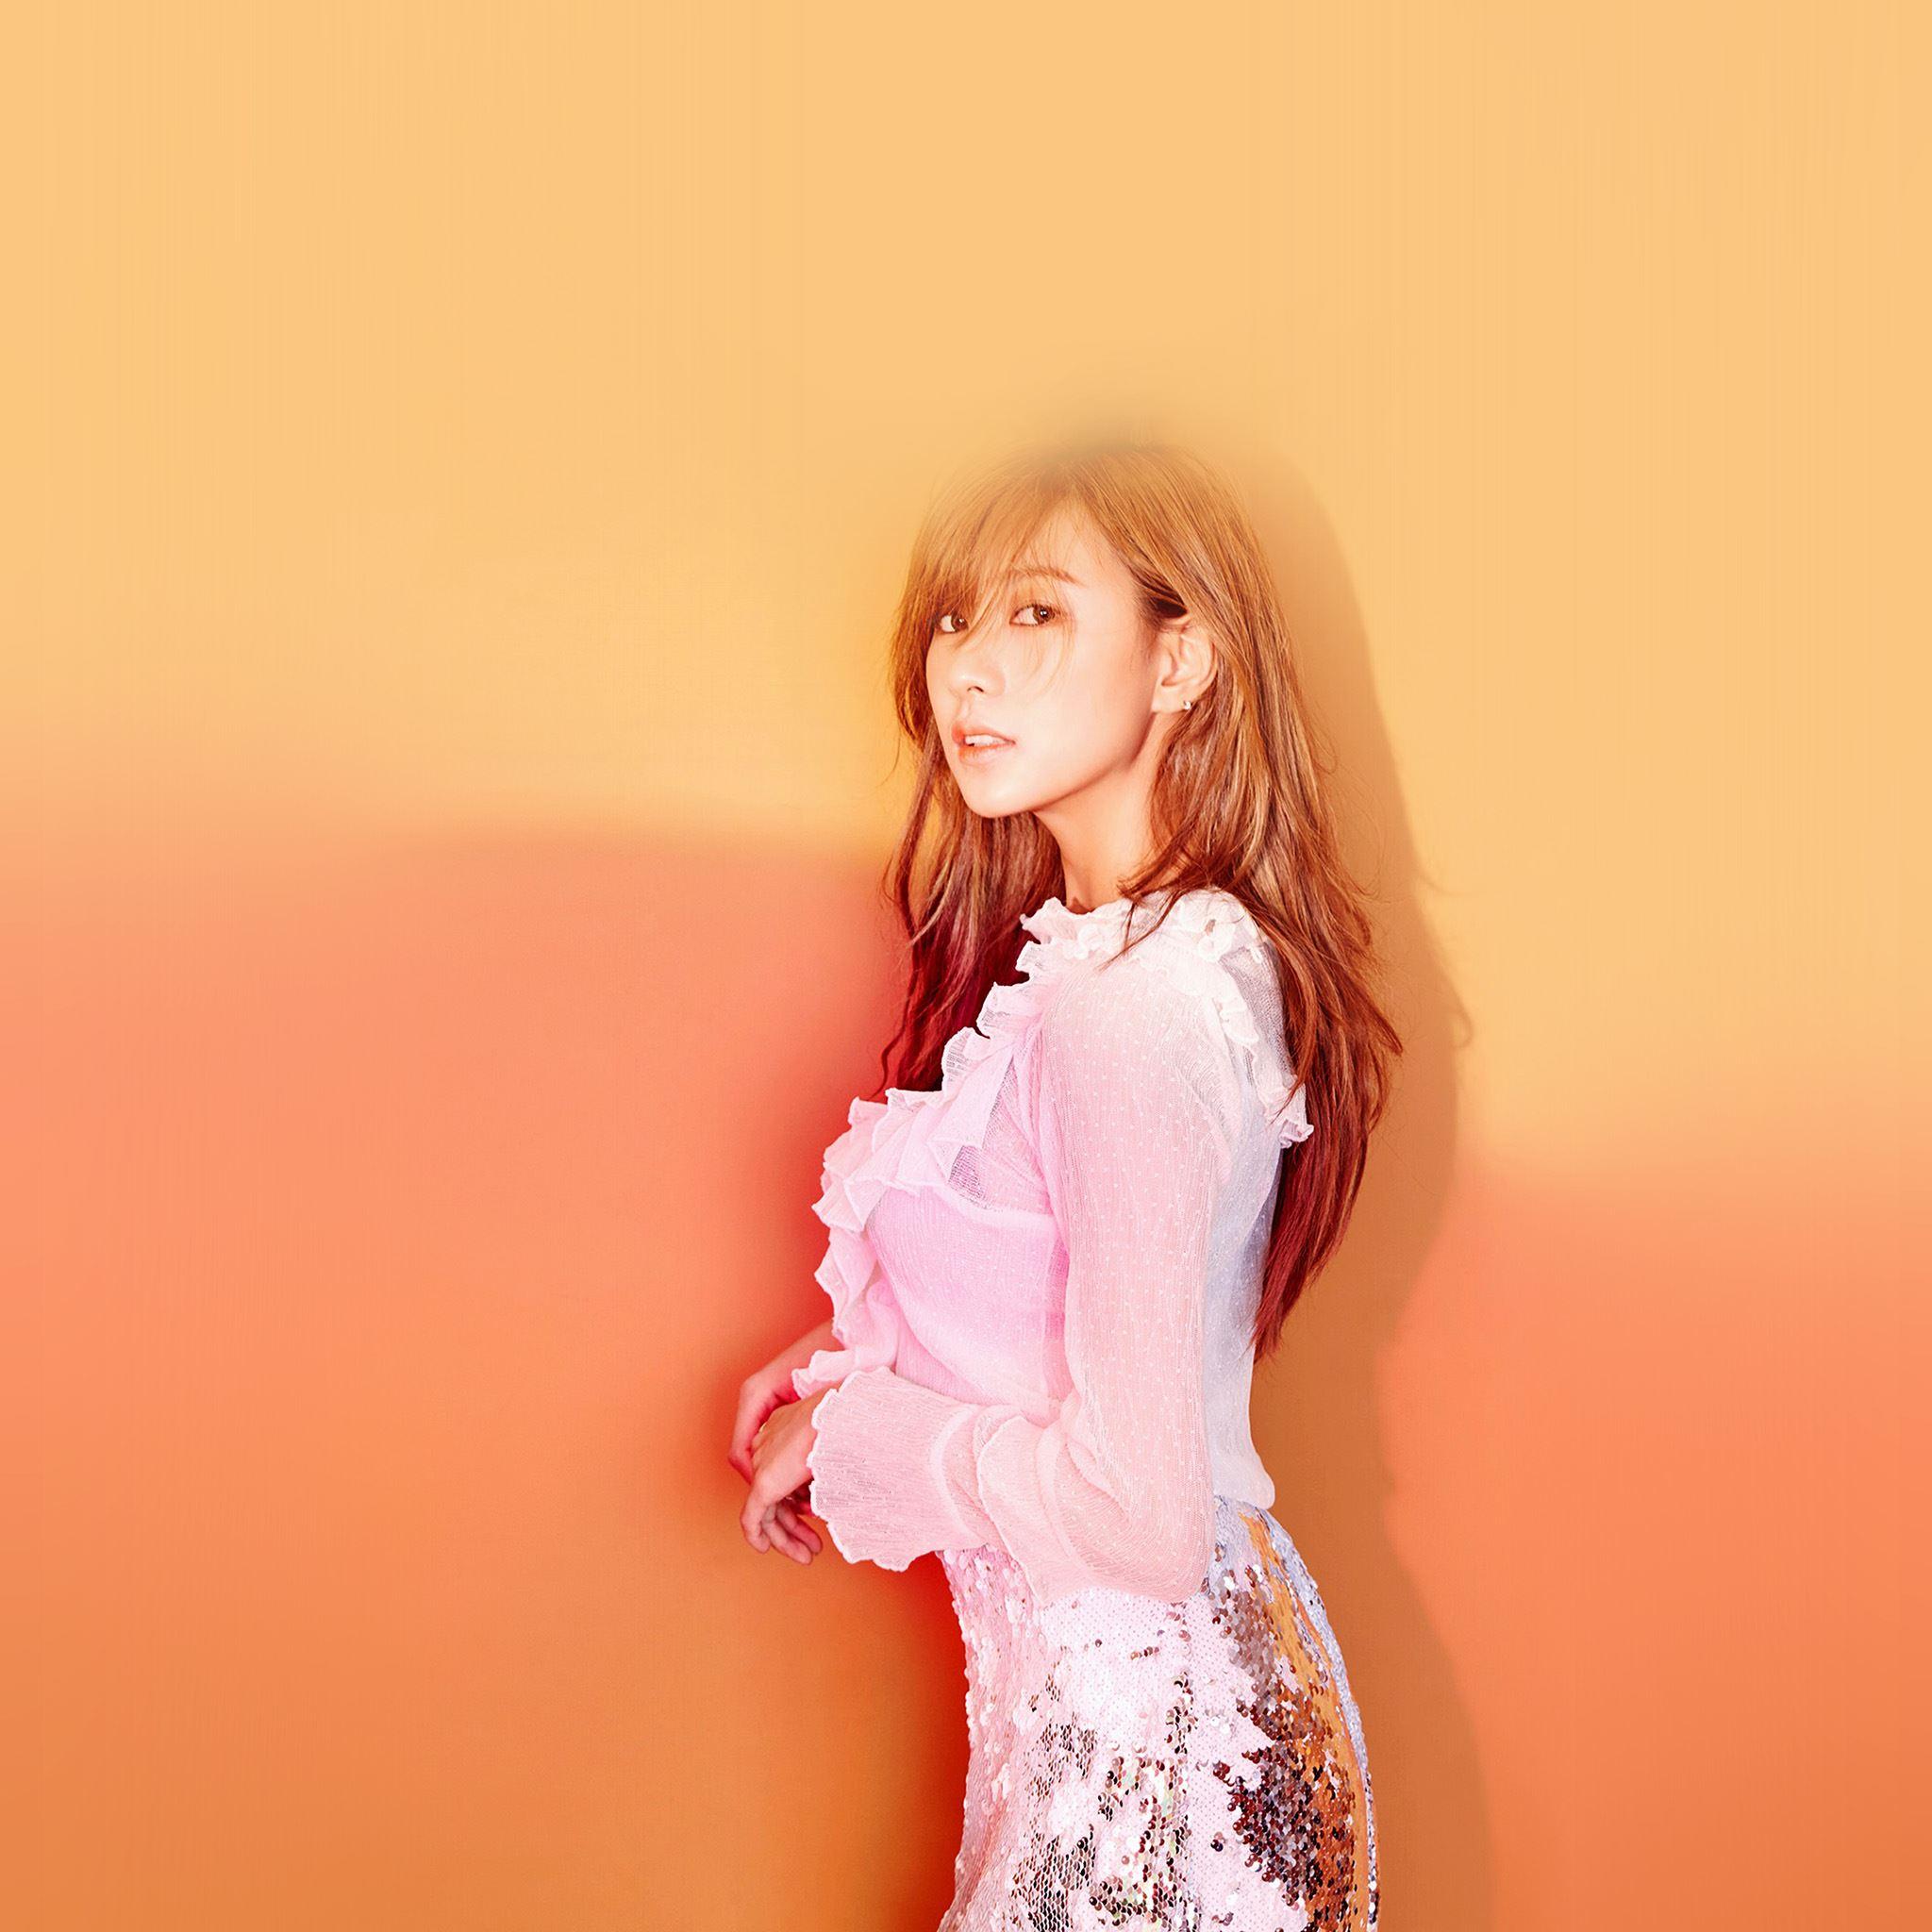 Kpop Girl Apink Hayoung Orange Red Ipad Air Wallpapers Free